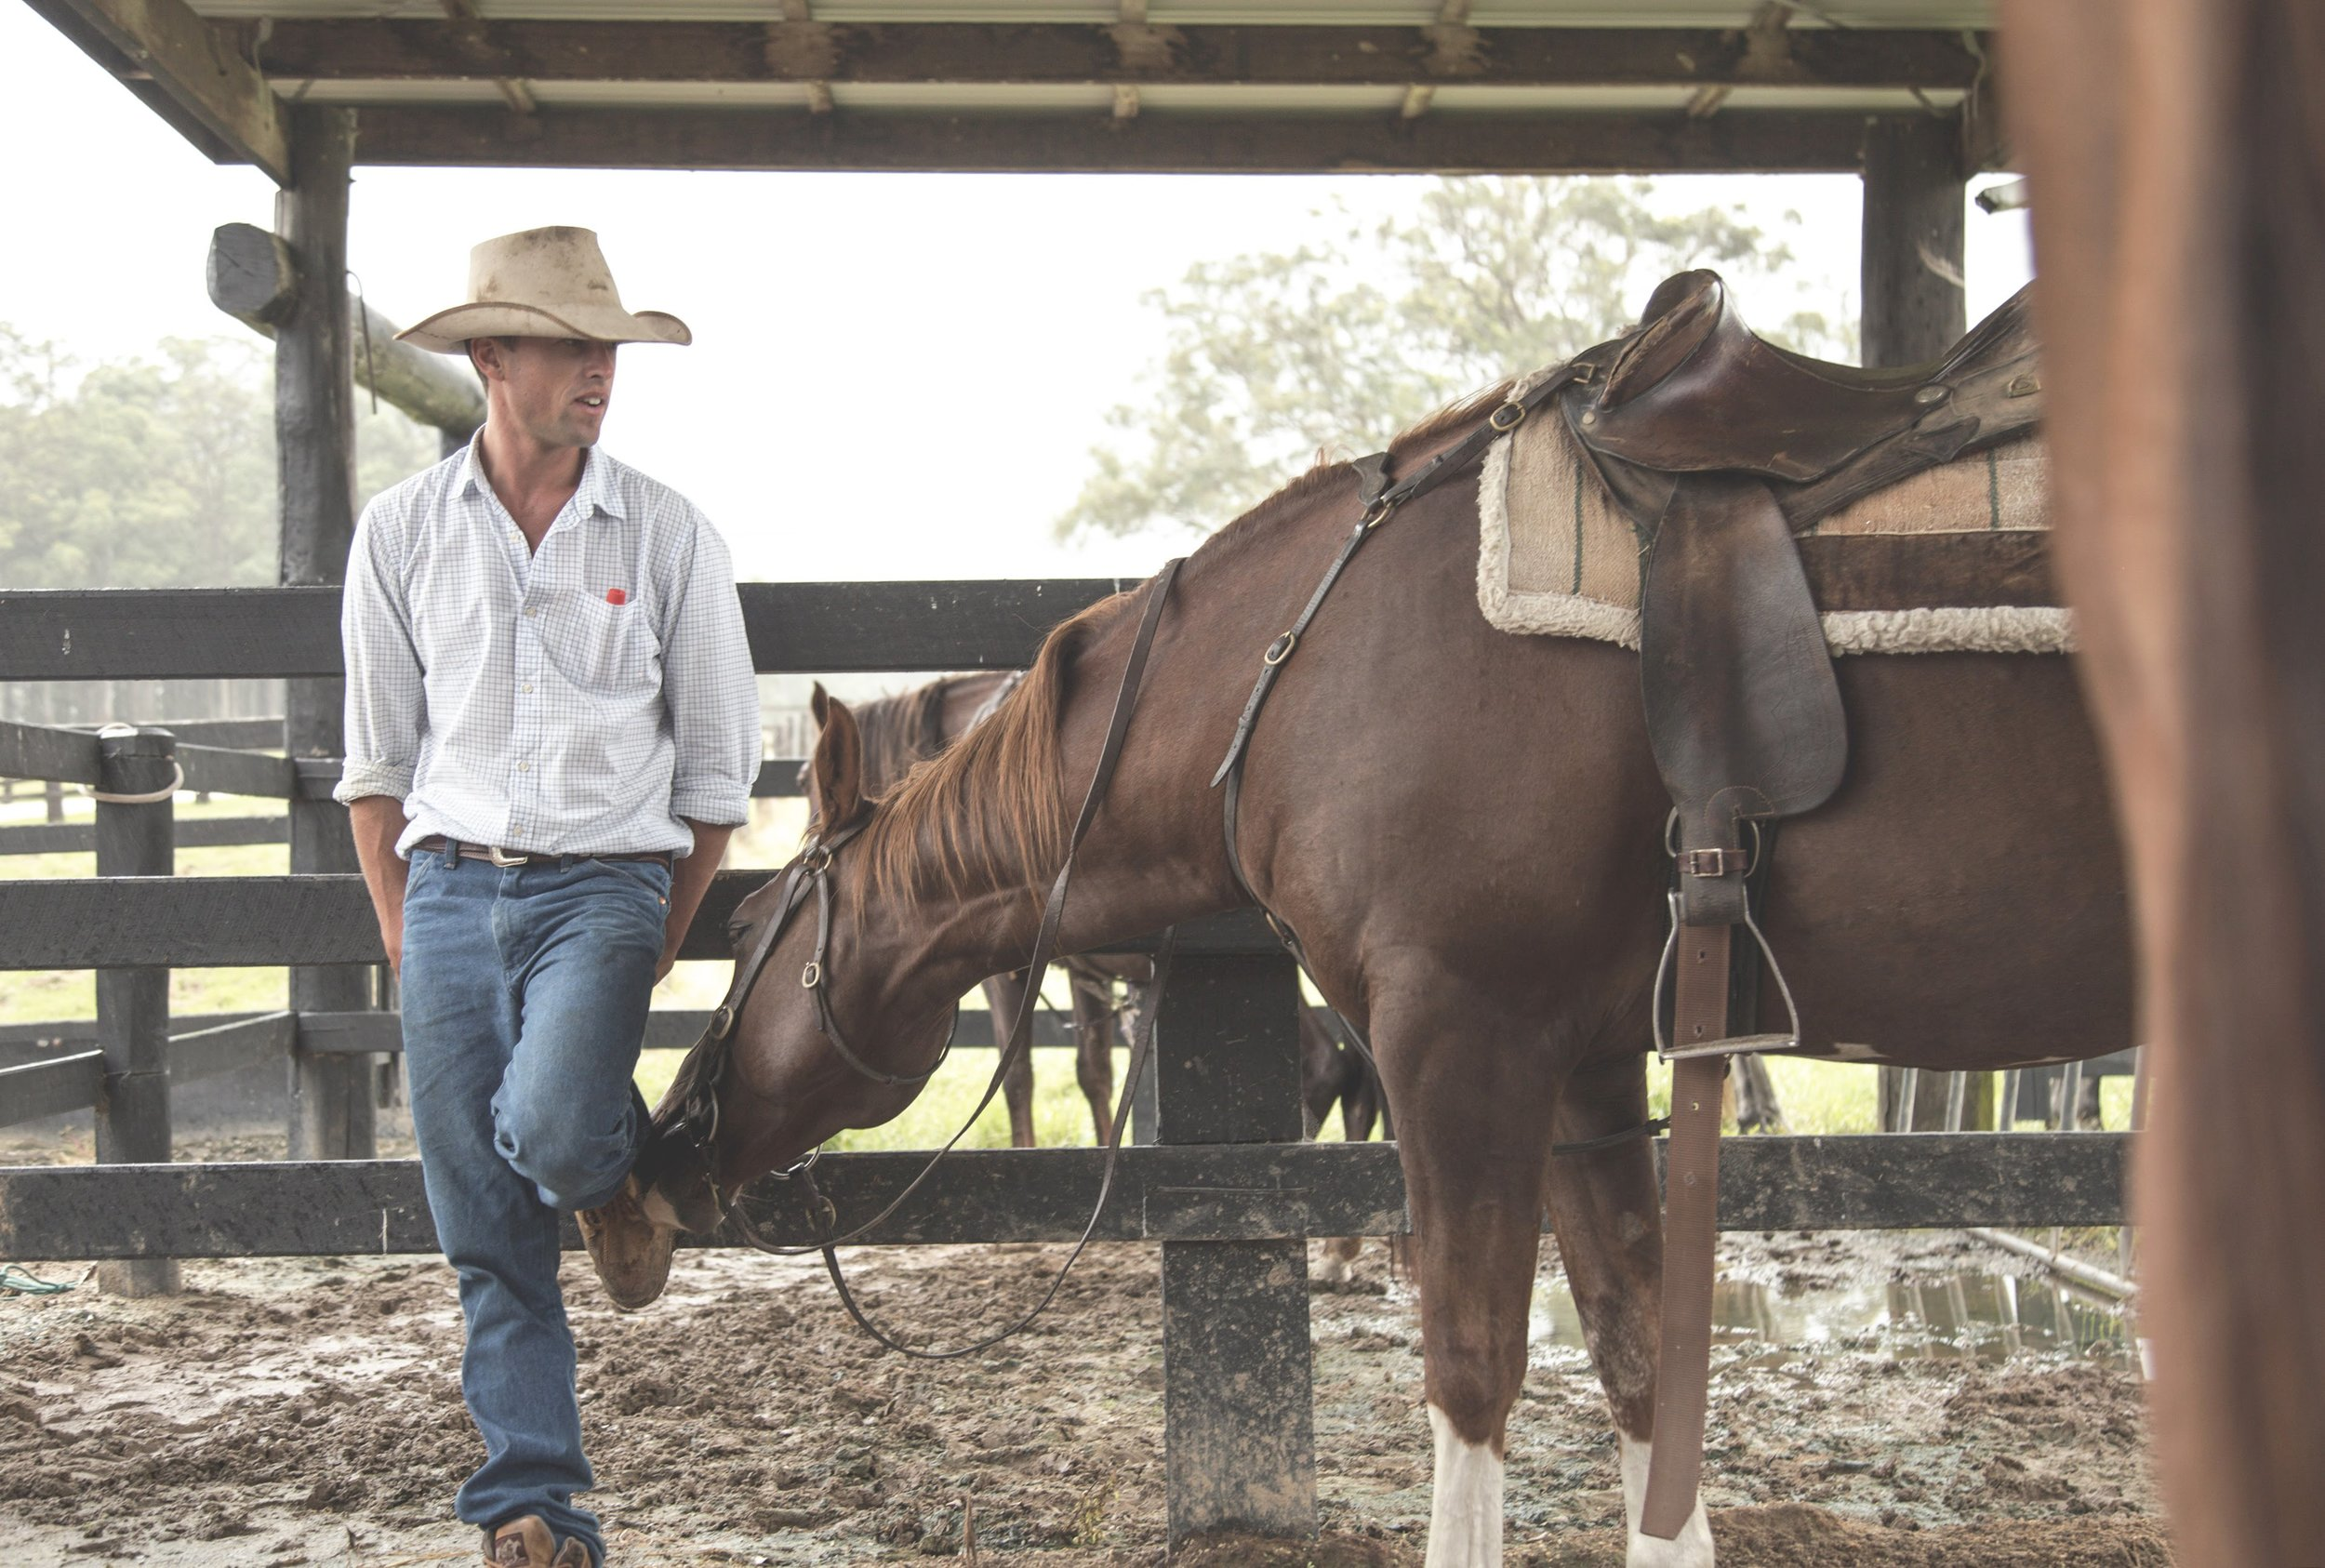 20180310_ABAdur_The Ranch Byron Bay New Edit_060.jpg